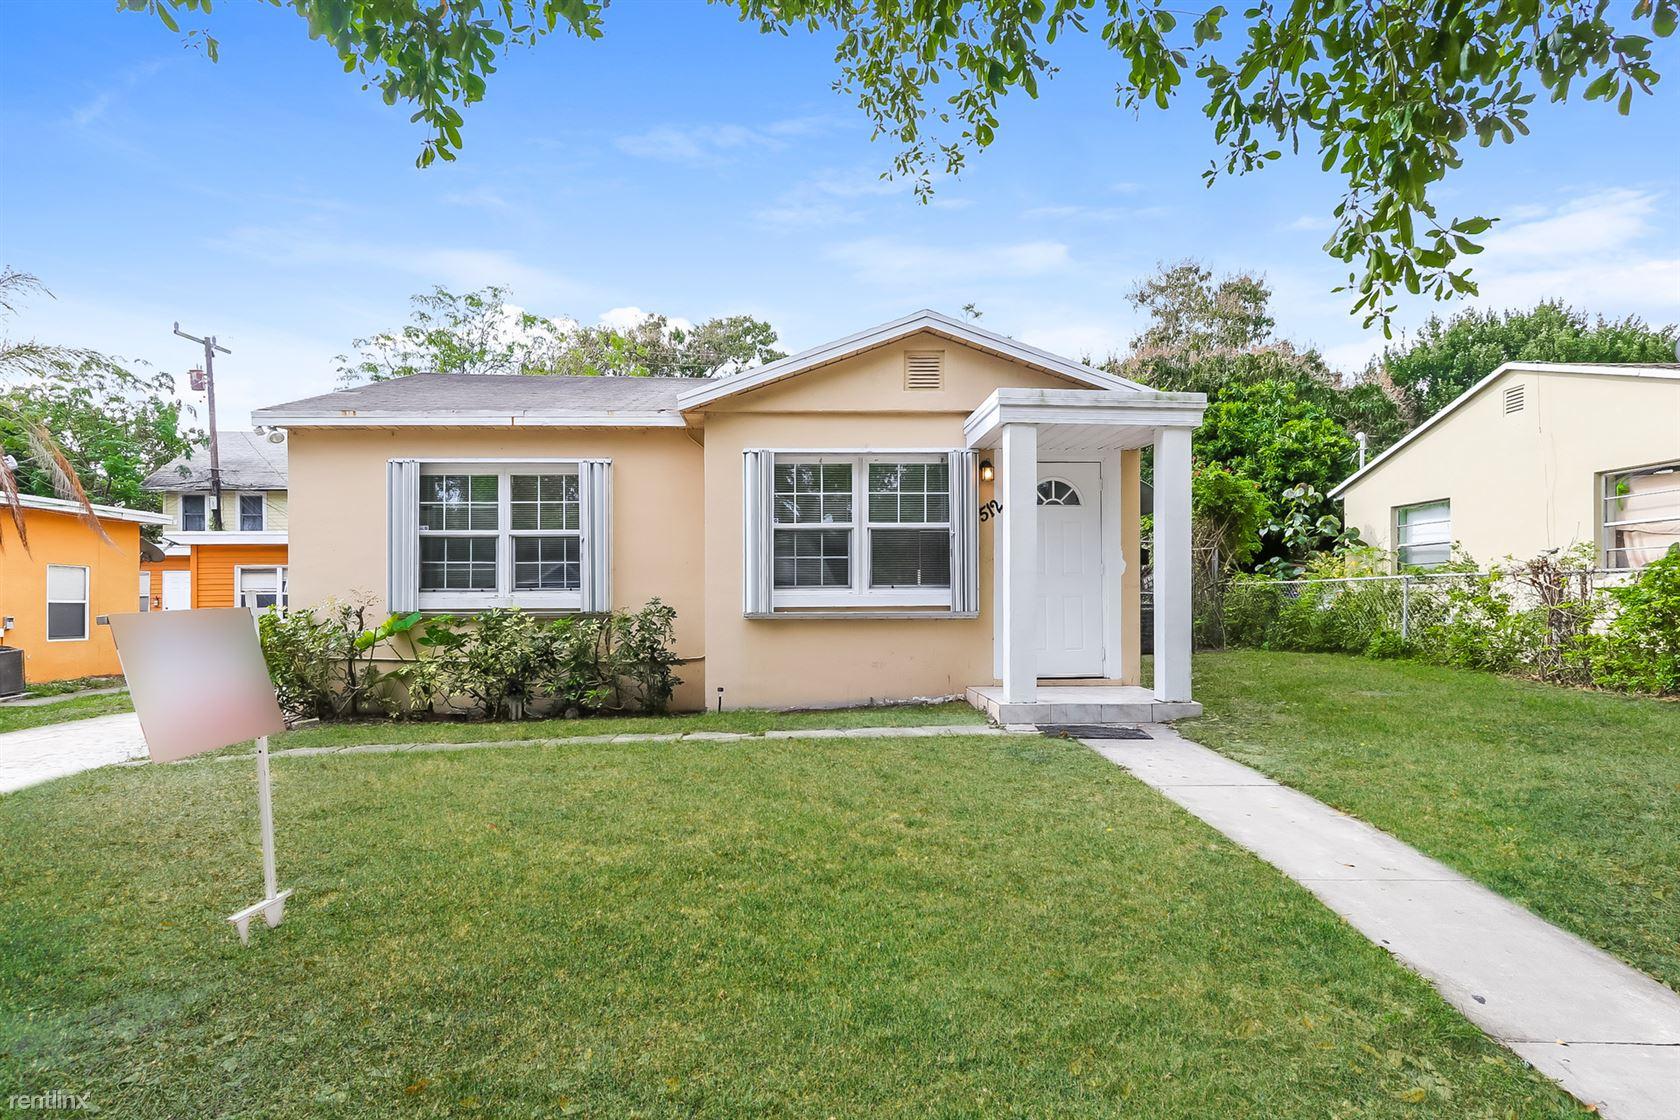 512 47th Street, West Palm Beach, FL - $0 USD/ month